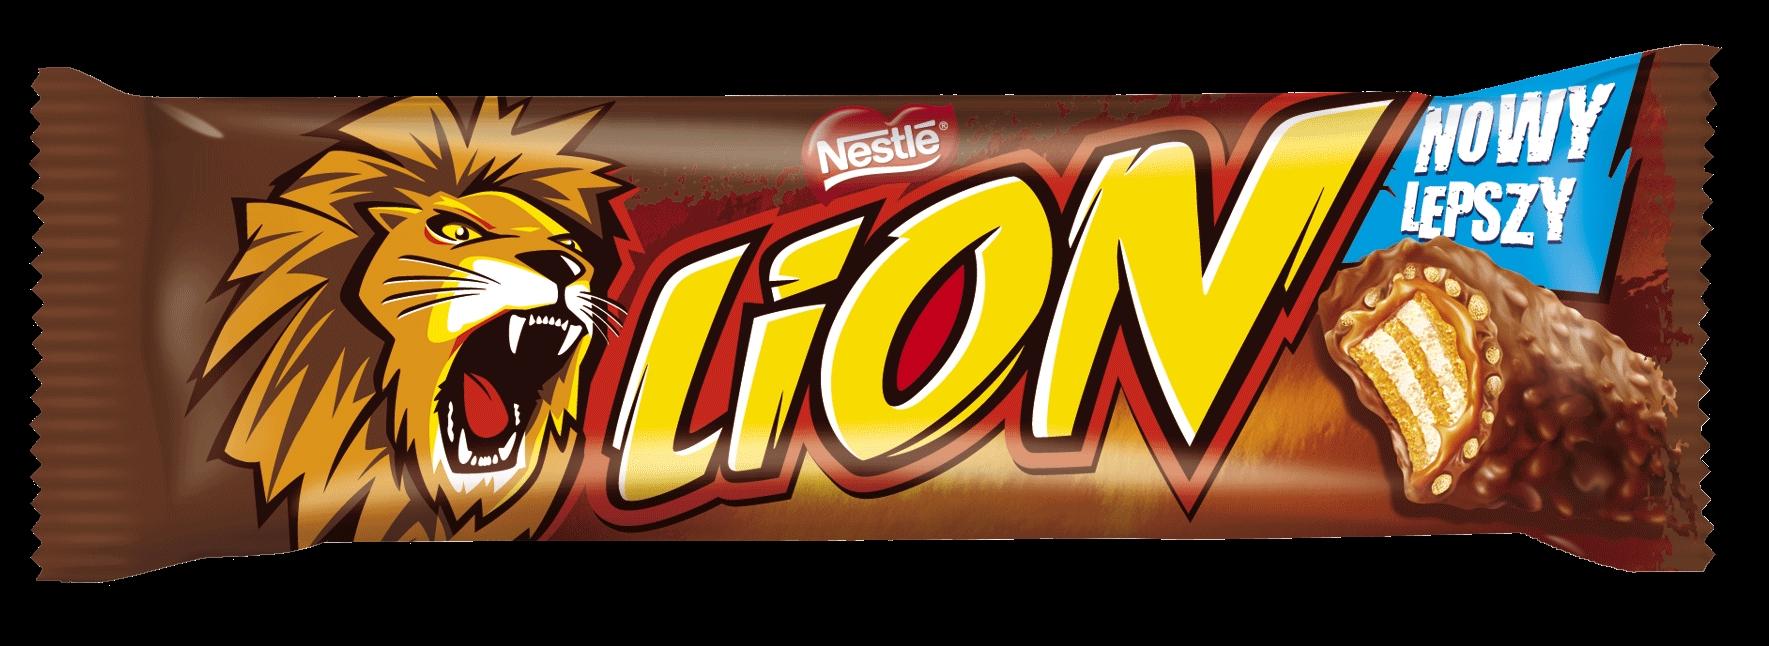 Baton Lion za 0,77 zł @ Kaufland